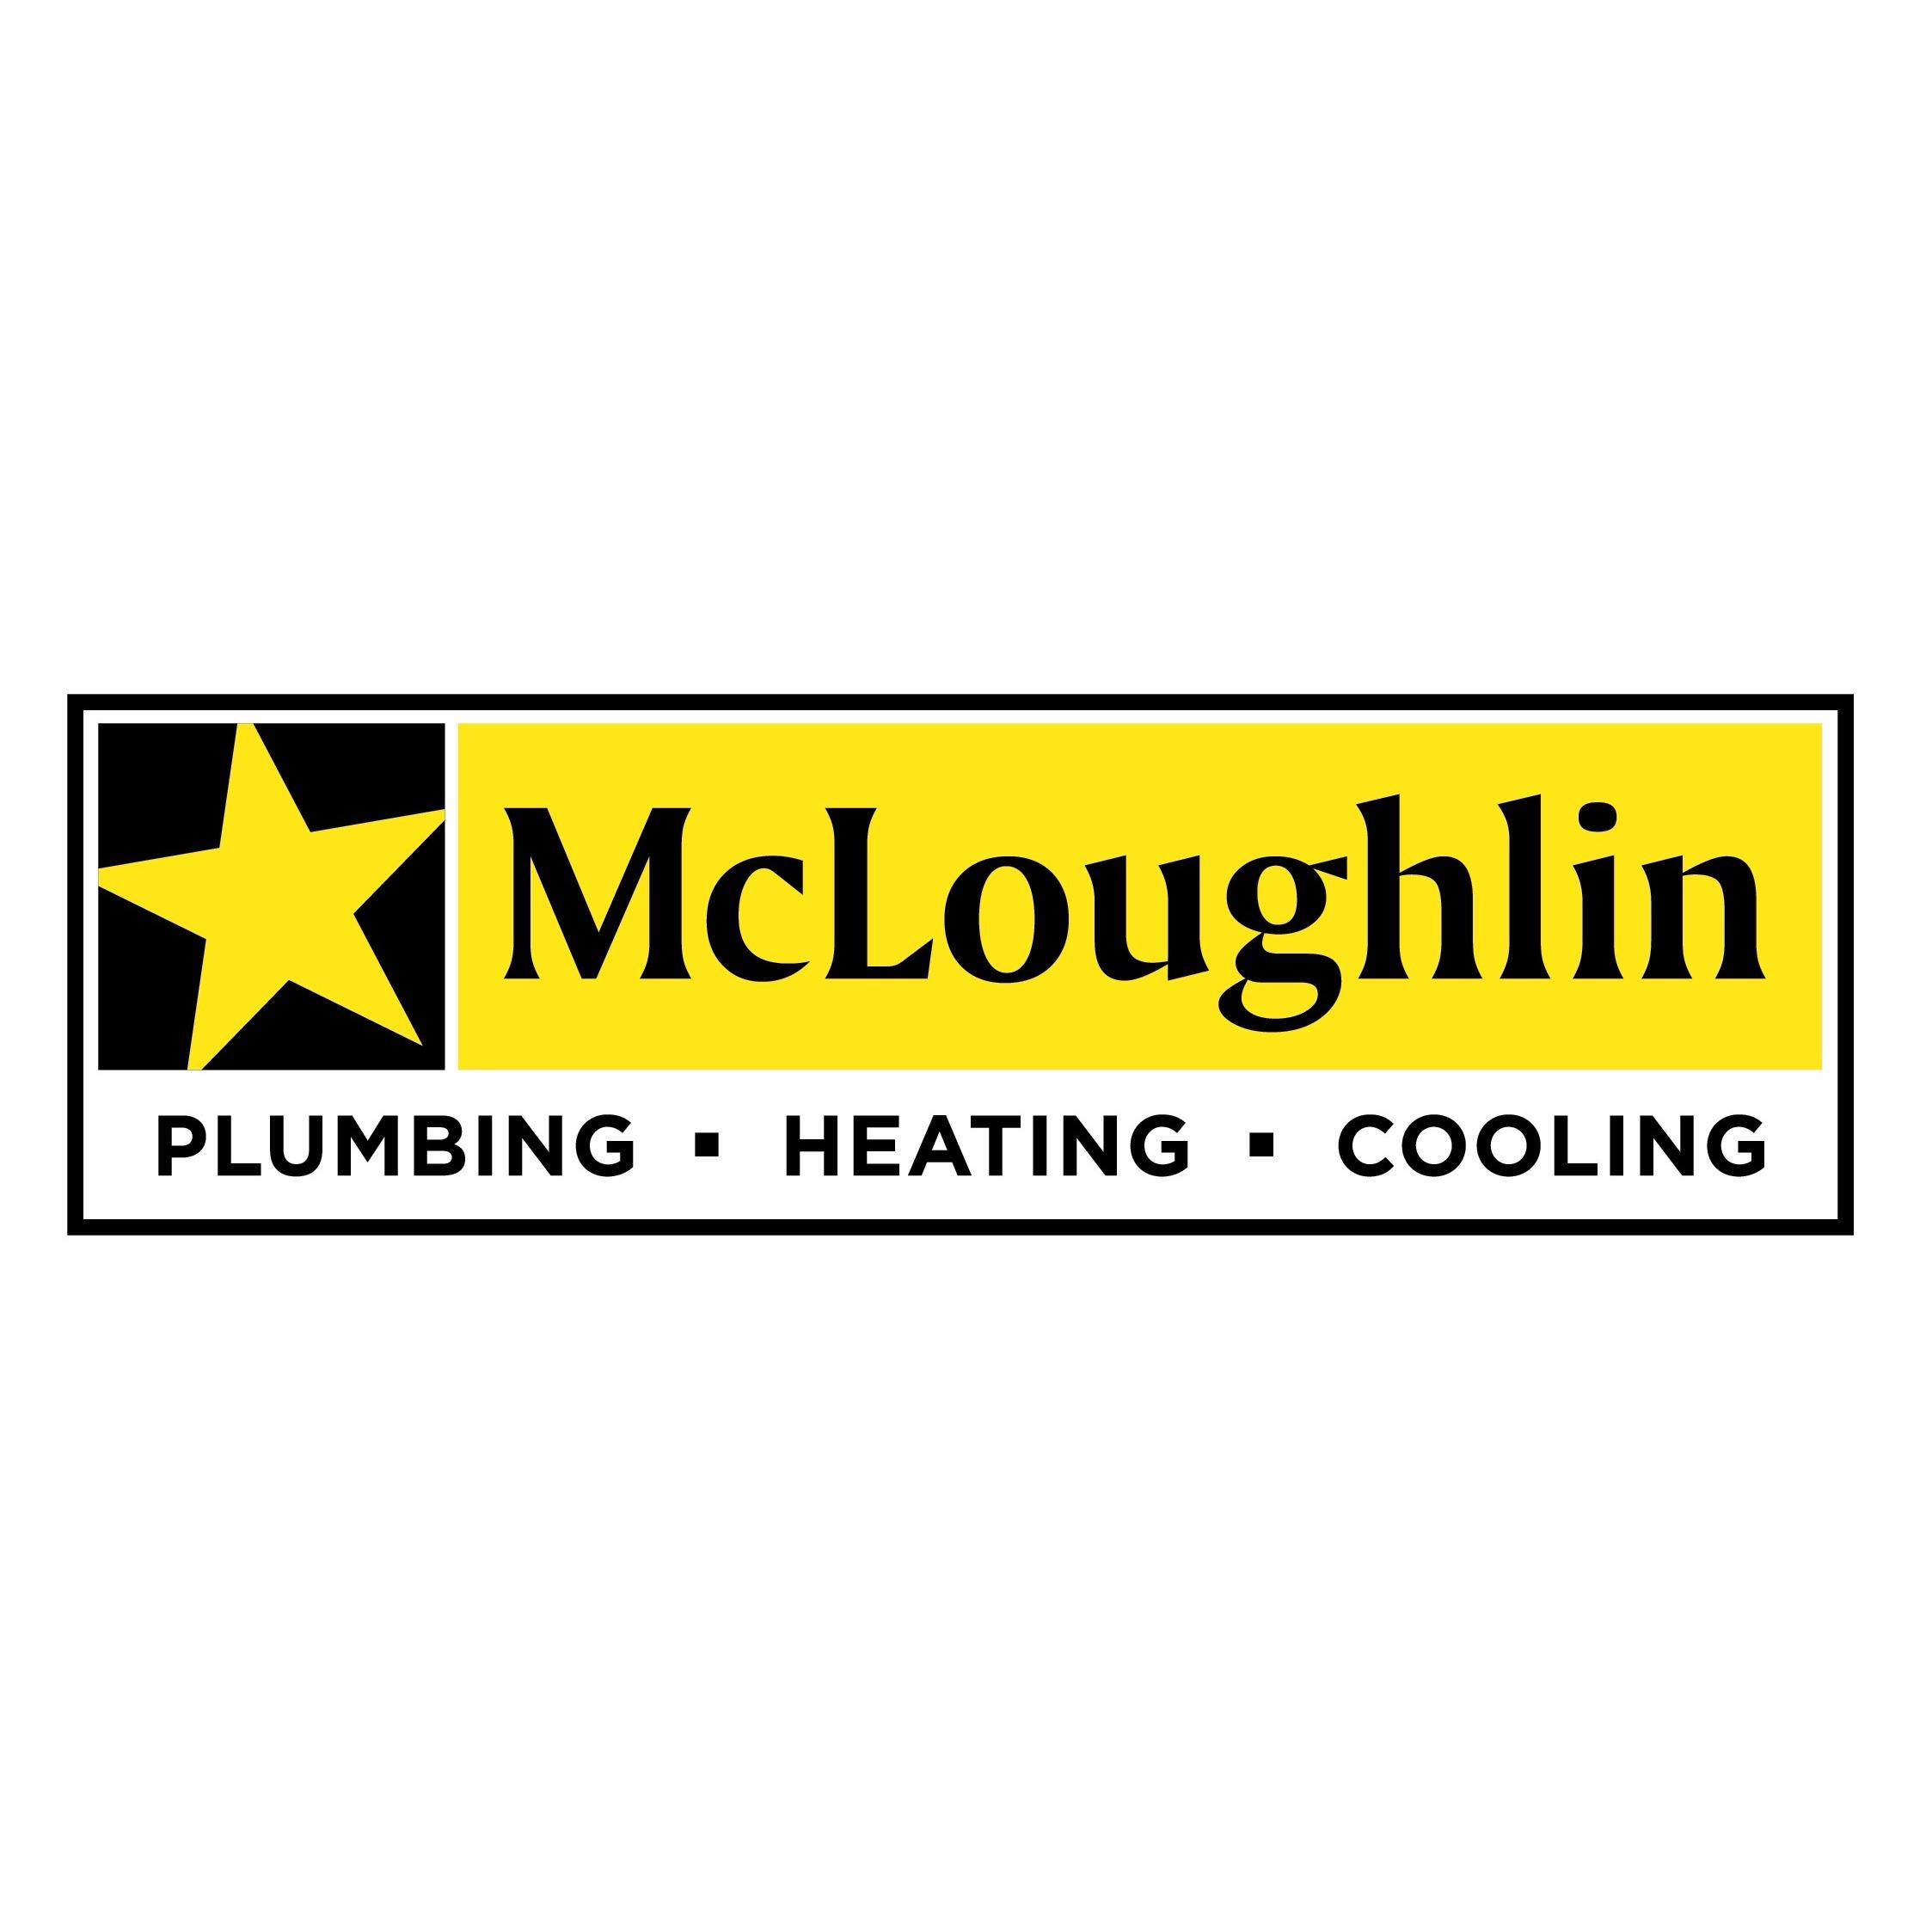 McLoughlin Plumbing Heating & Cooling - Upper Darby, PA - Plumbers & Sewer Repair